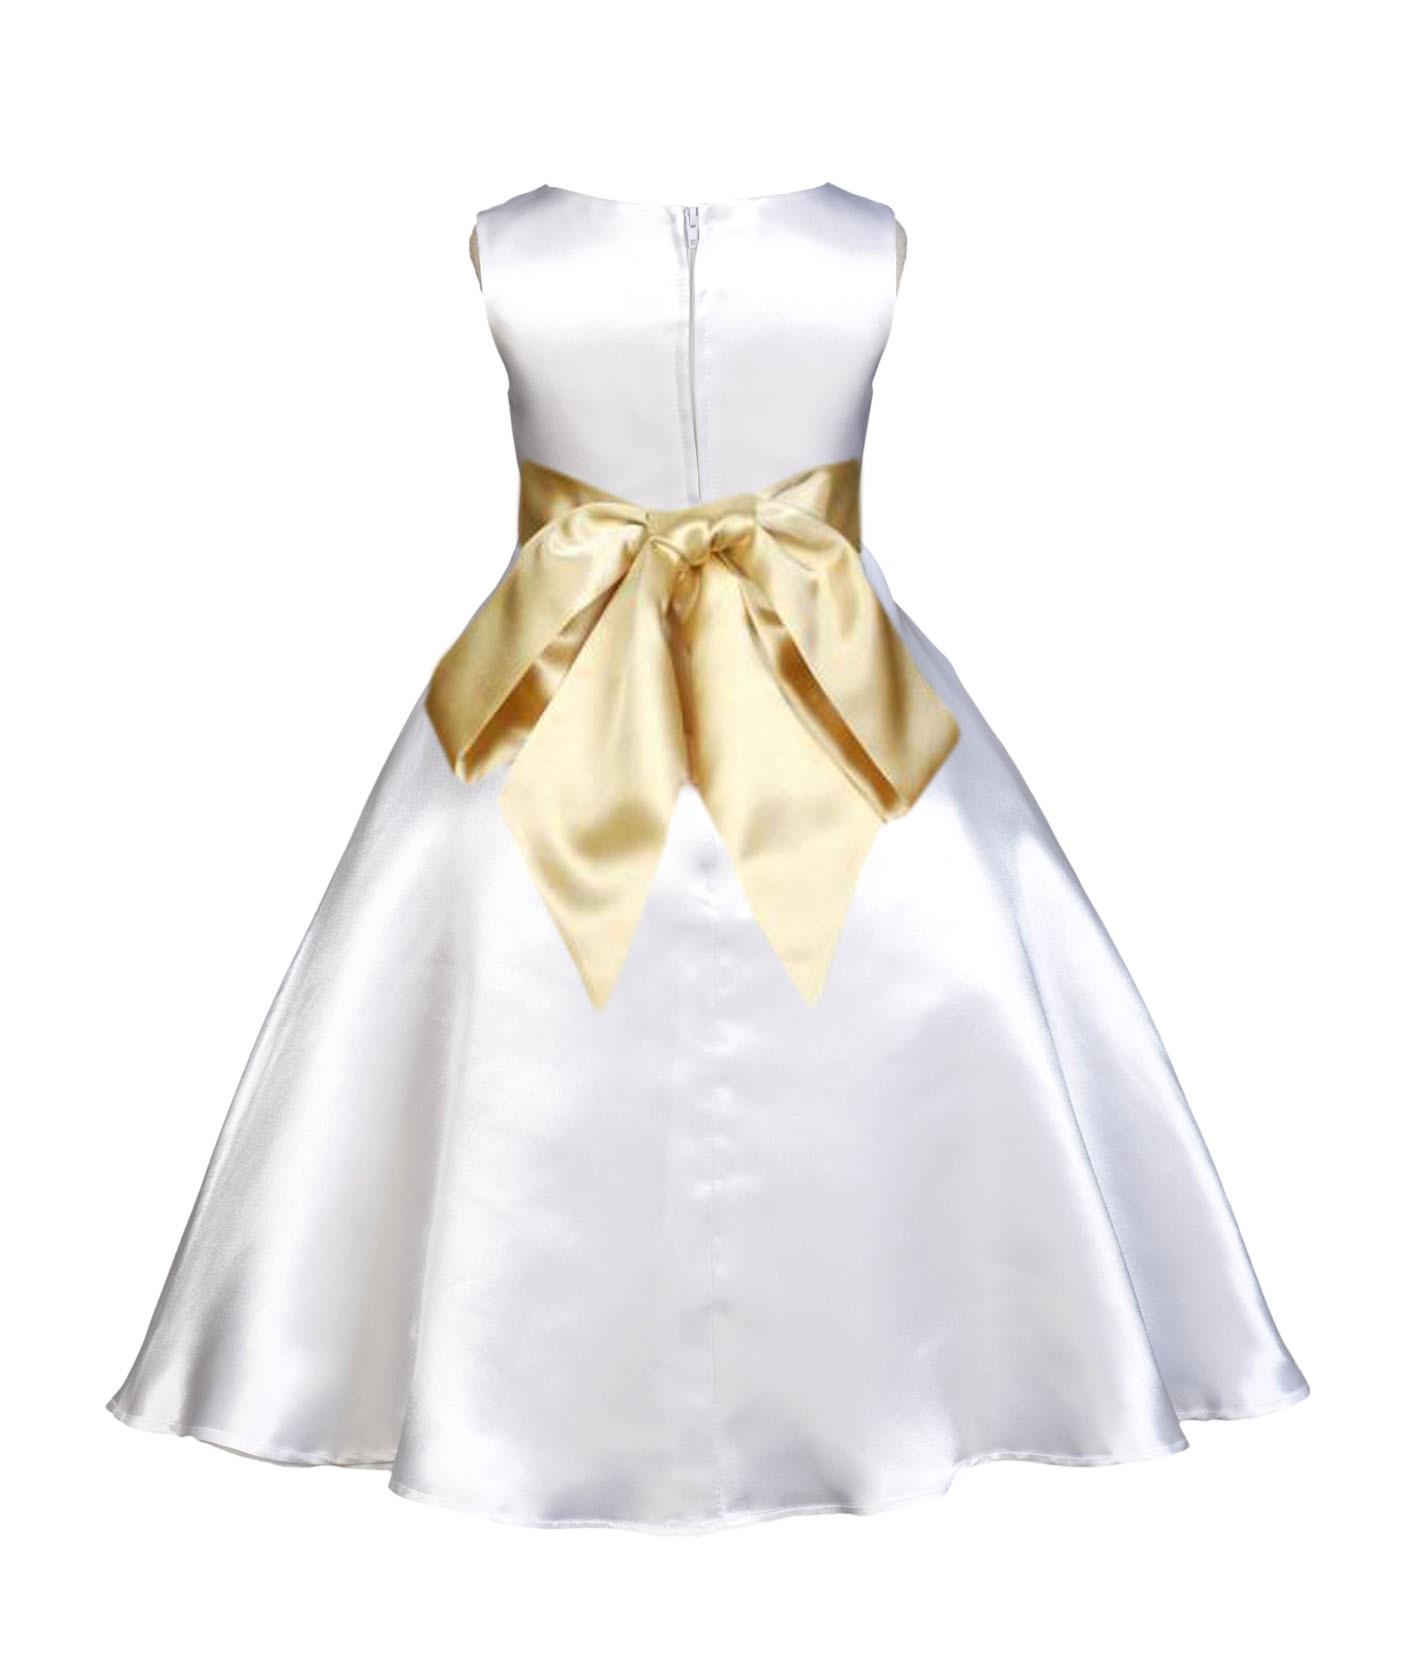 Whitegold a line satin flower girl dress wedding bridal 821s whitegold a line satin flower girl dress wedding bridal 821s mightylinksfo